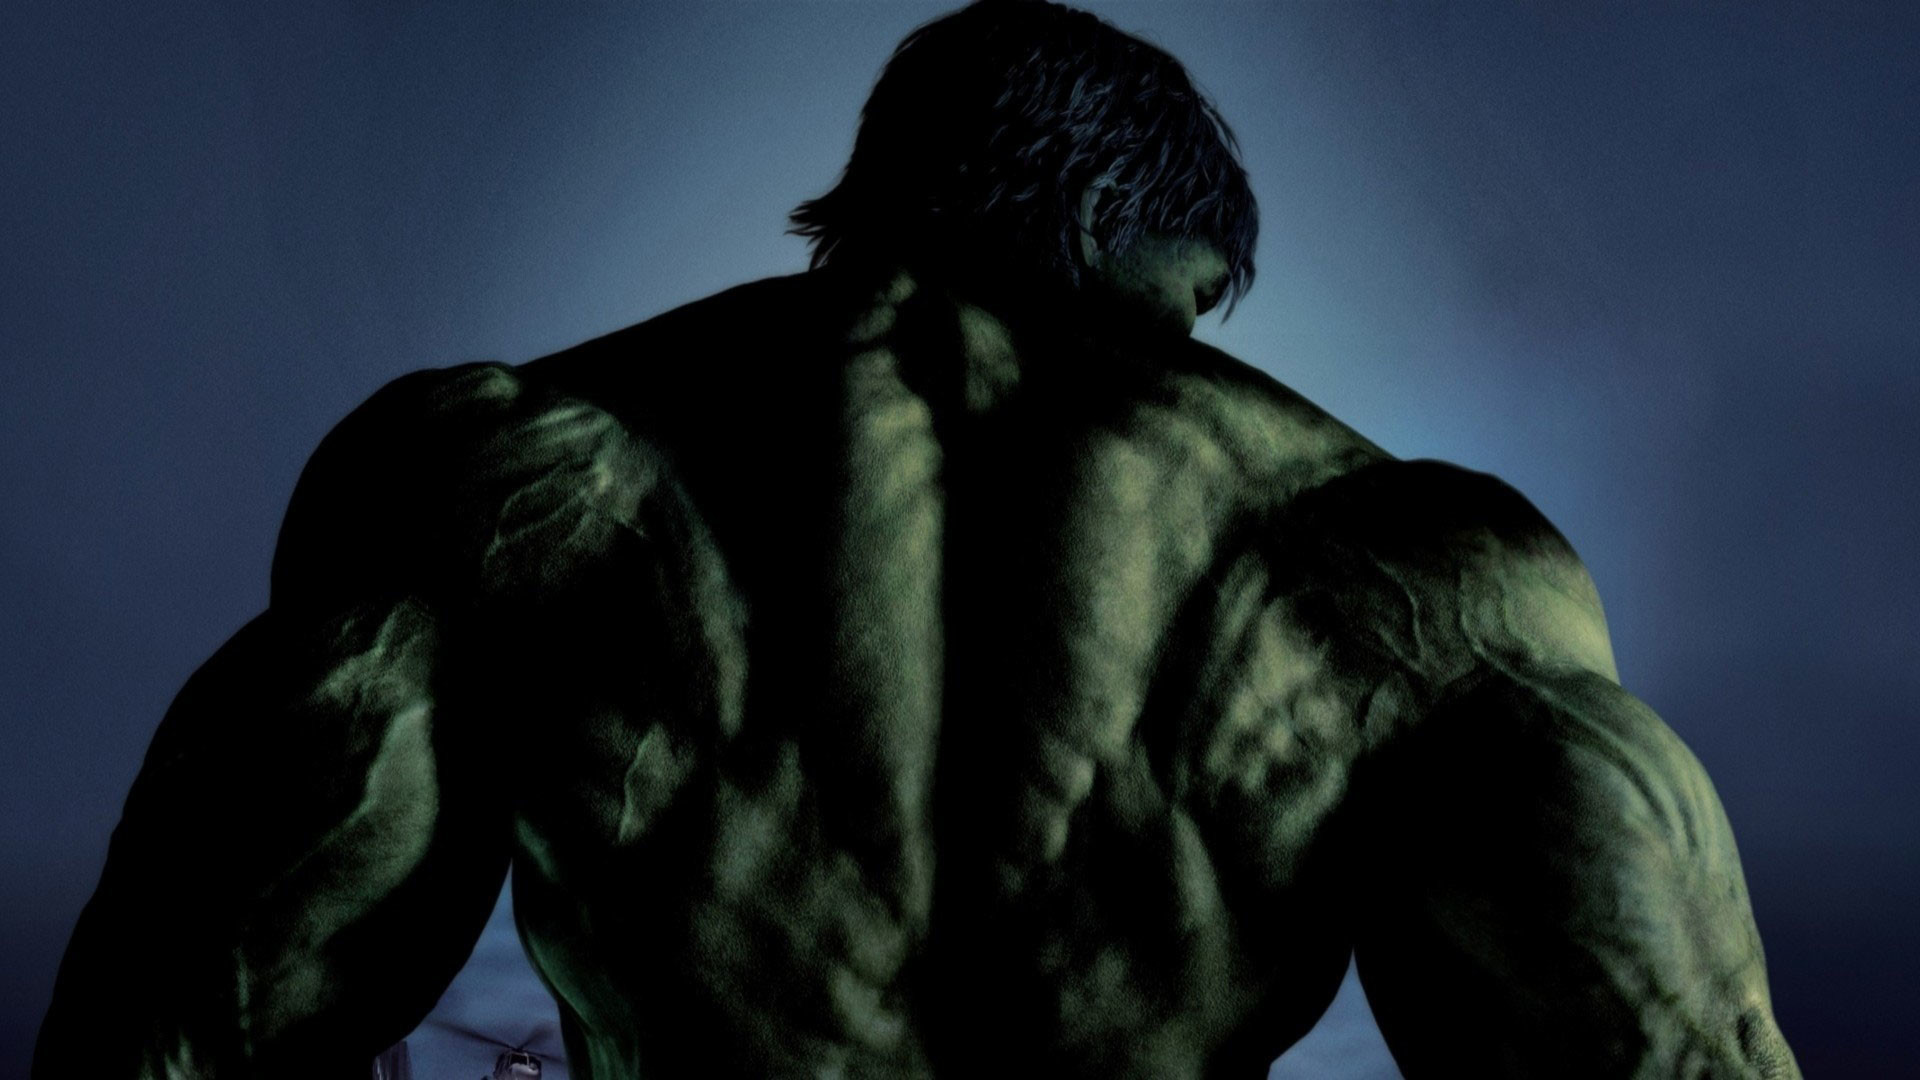 hd pics photos stunning attractive hulk 11 hd desktop background wallpaper